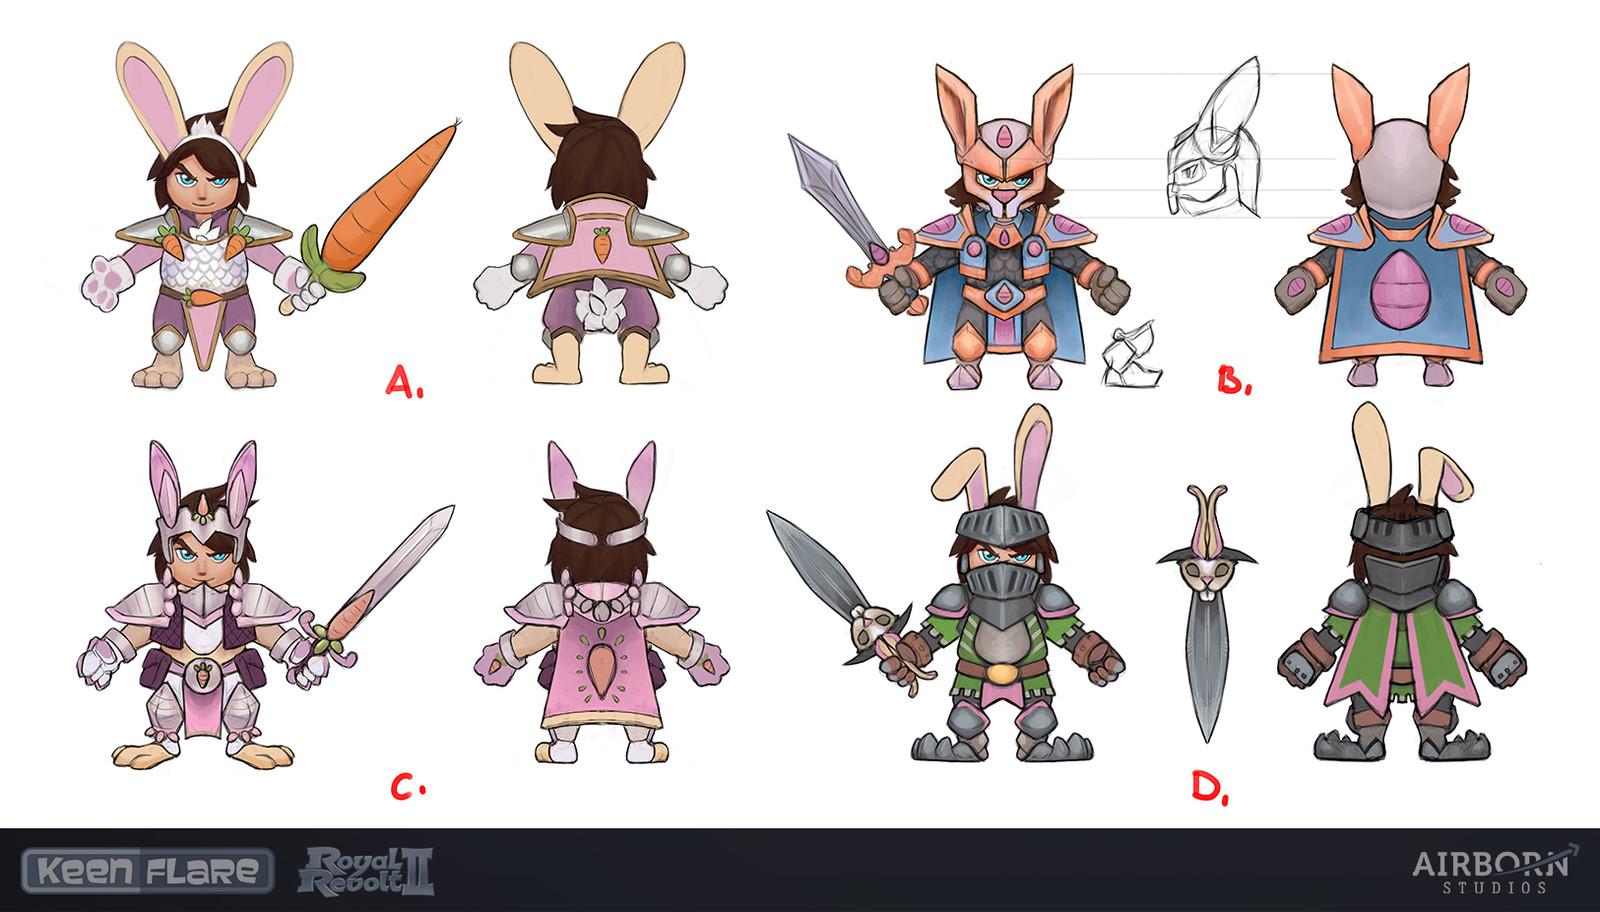 Royal Revolt 2: Bunny Set first drafts by Mario Manzanares